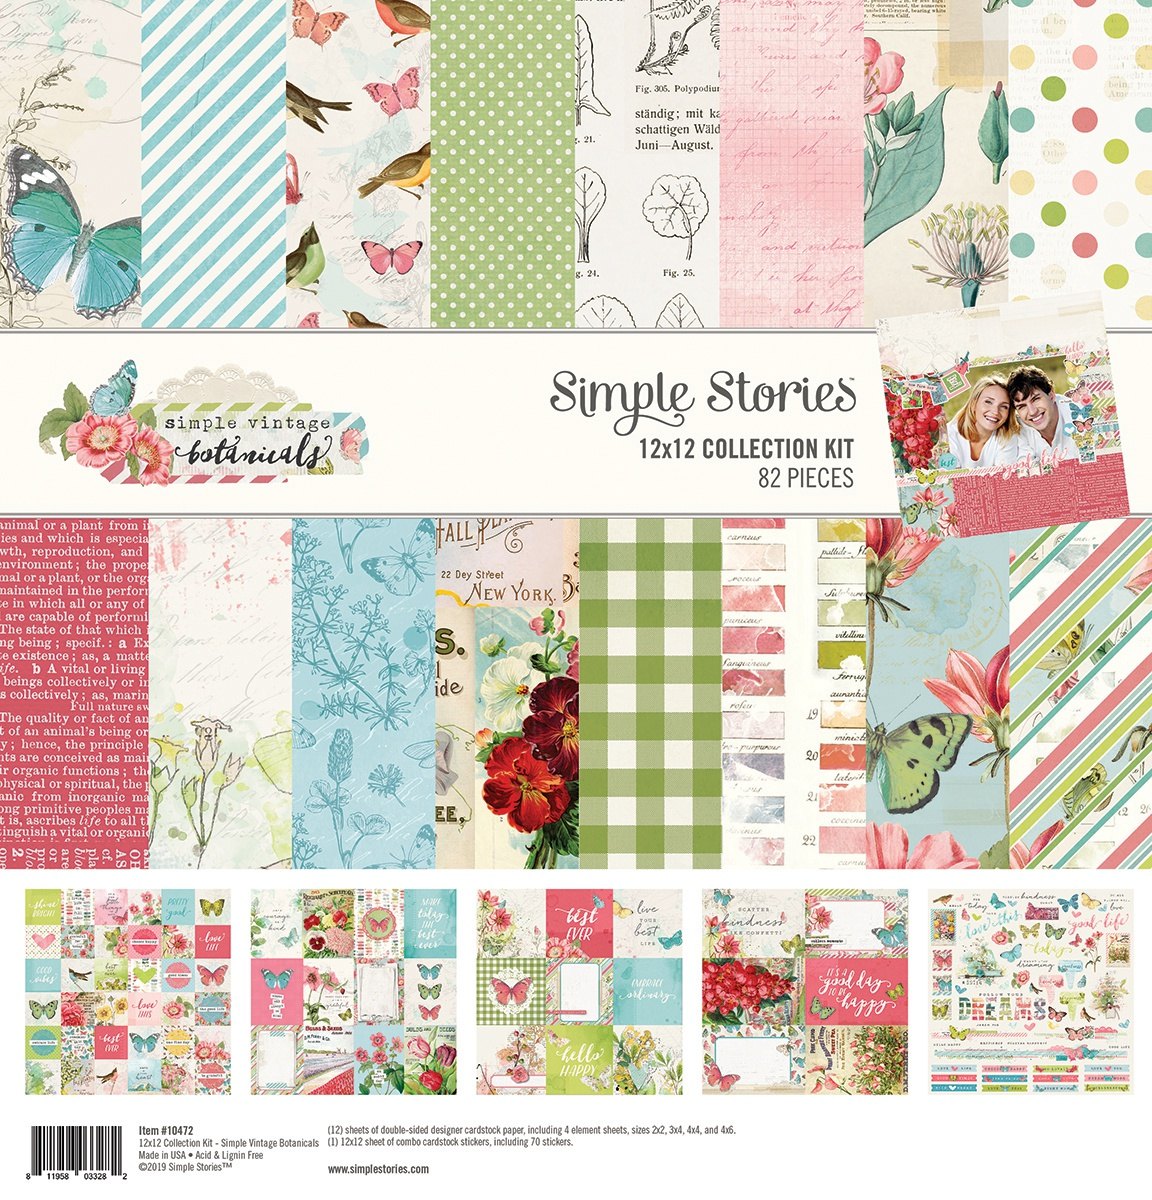 Simple Stories Collection Kit 12X12-Simple Vintage Botanicals